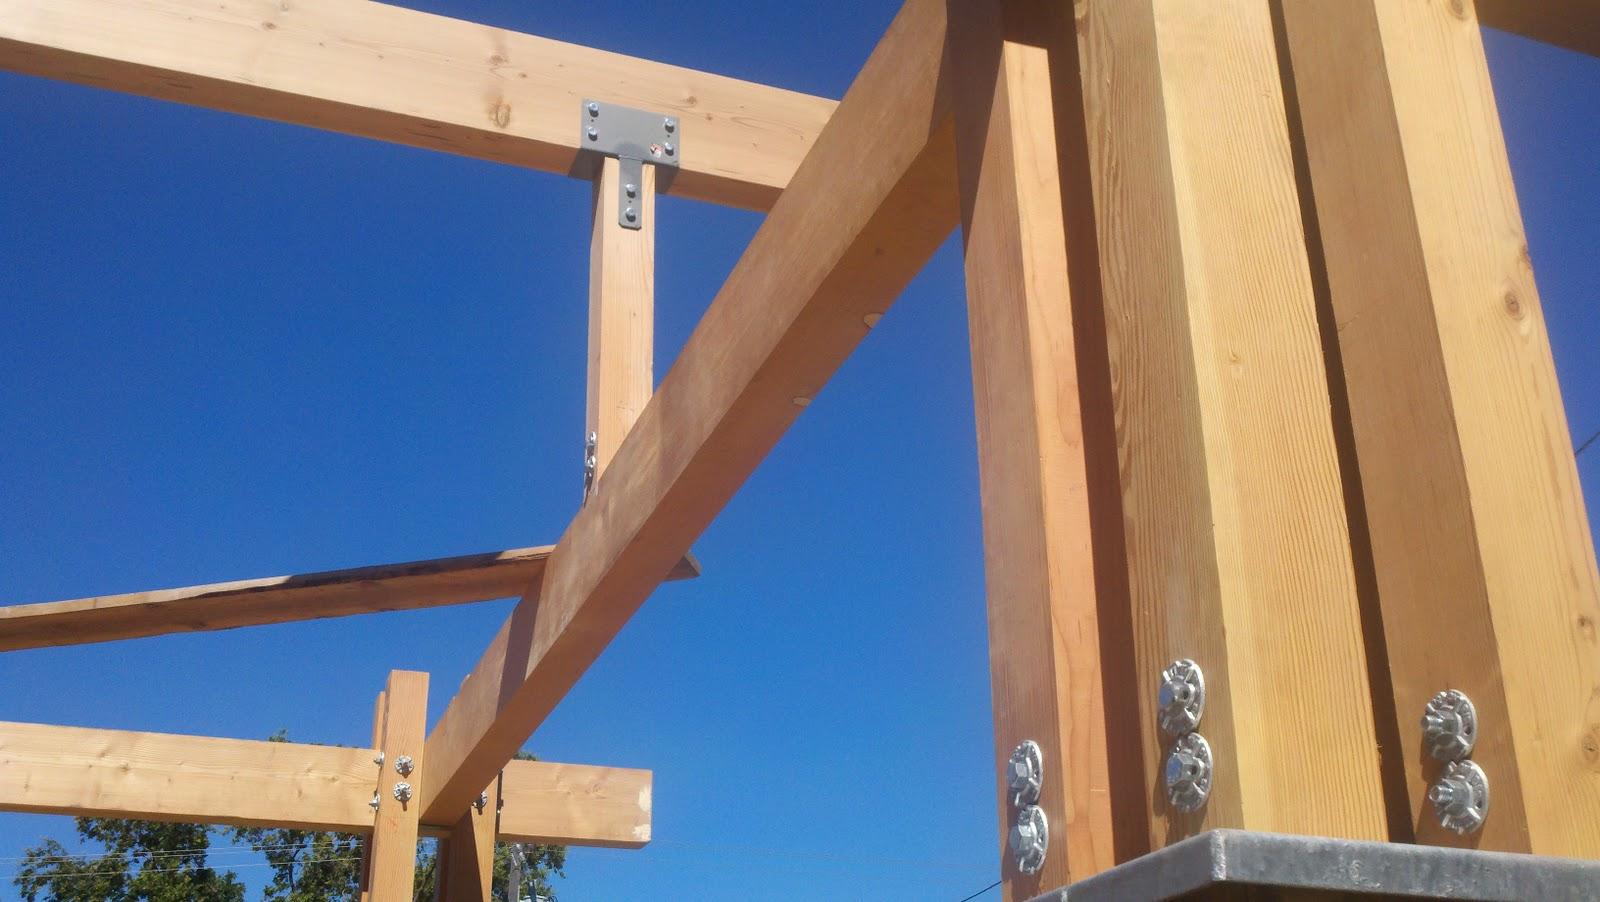 structural corbels detail view of structural. Black Bedroom Furniture Sets. Home Design Ideas